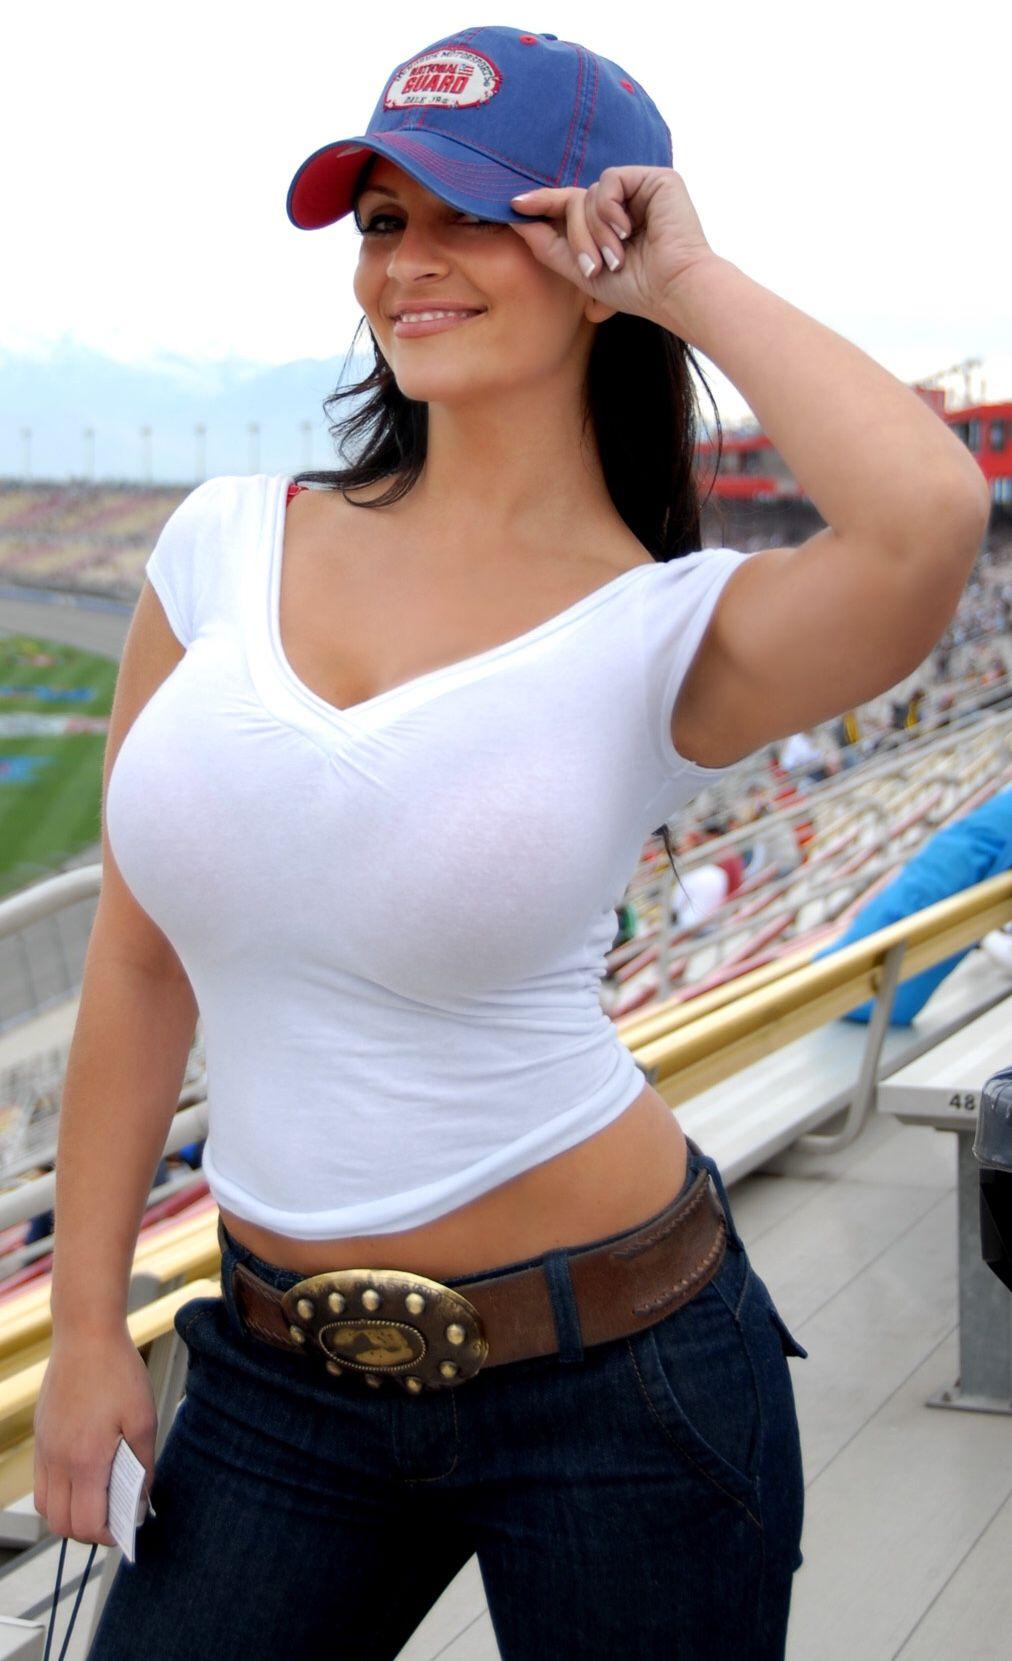 busty-girls-in-tights-shirts-naked-shia